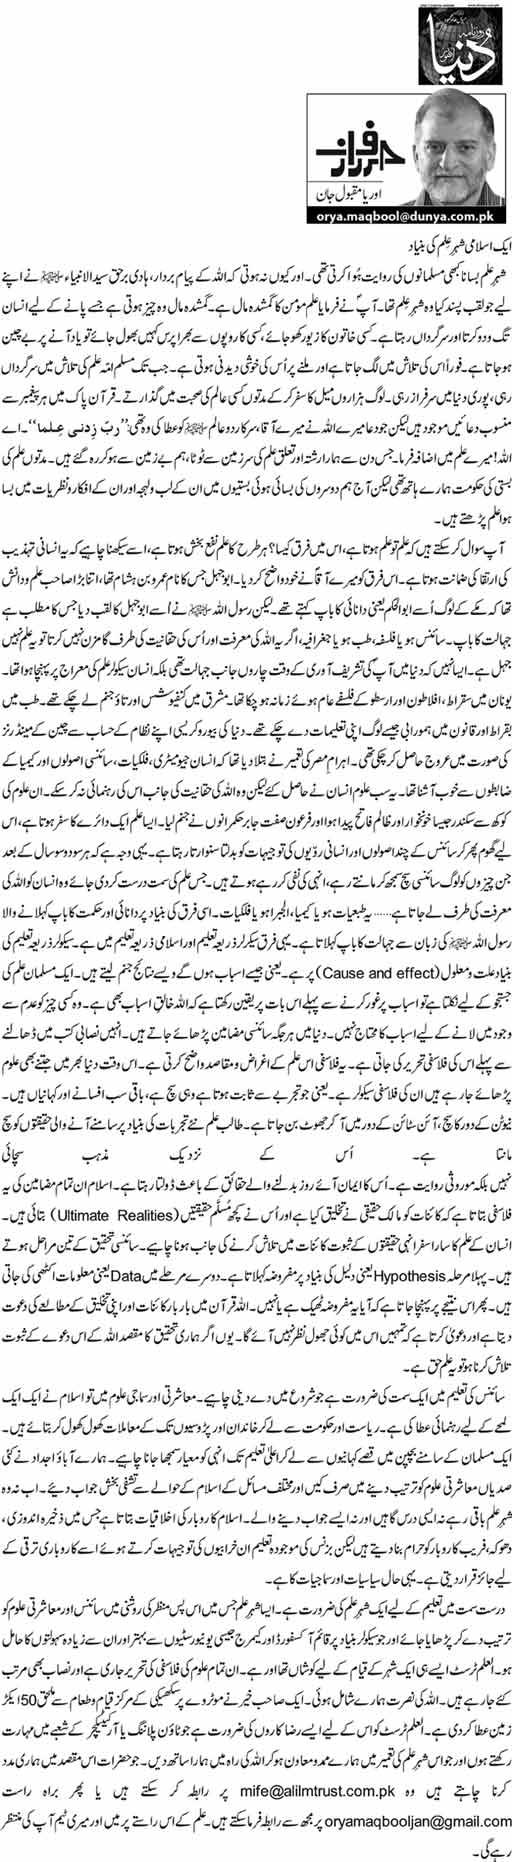 Aik Islami shehr e ilm ki bunyad - Orya Maqbool Jan